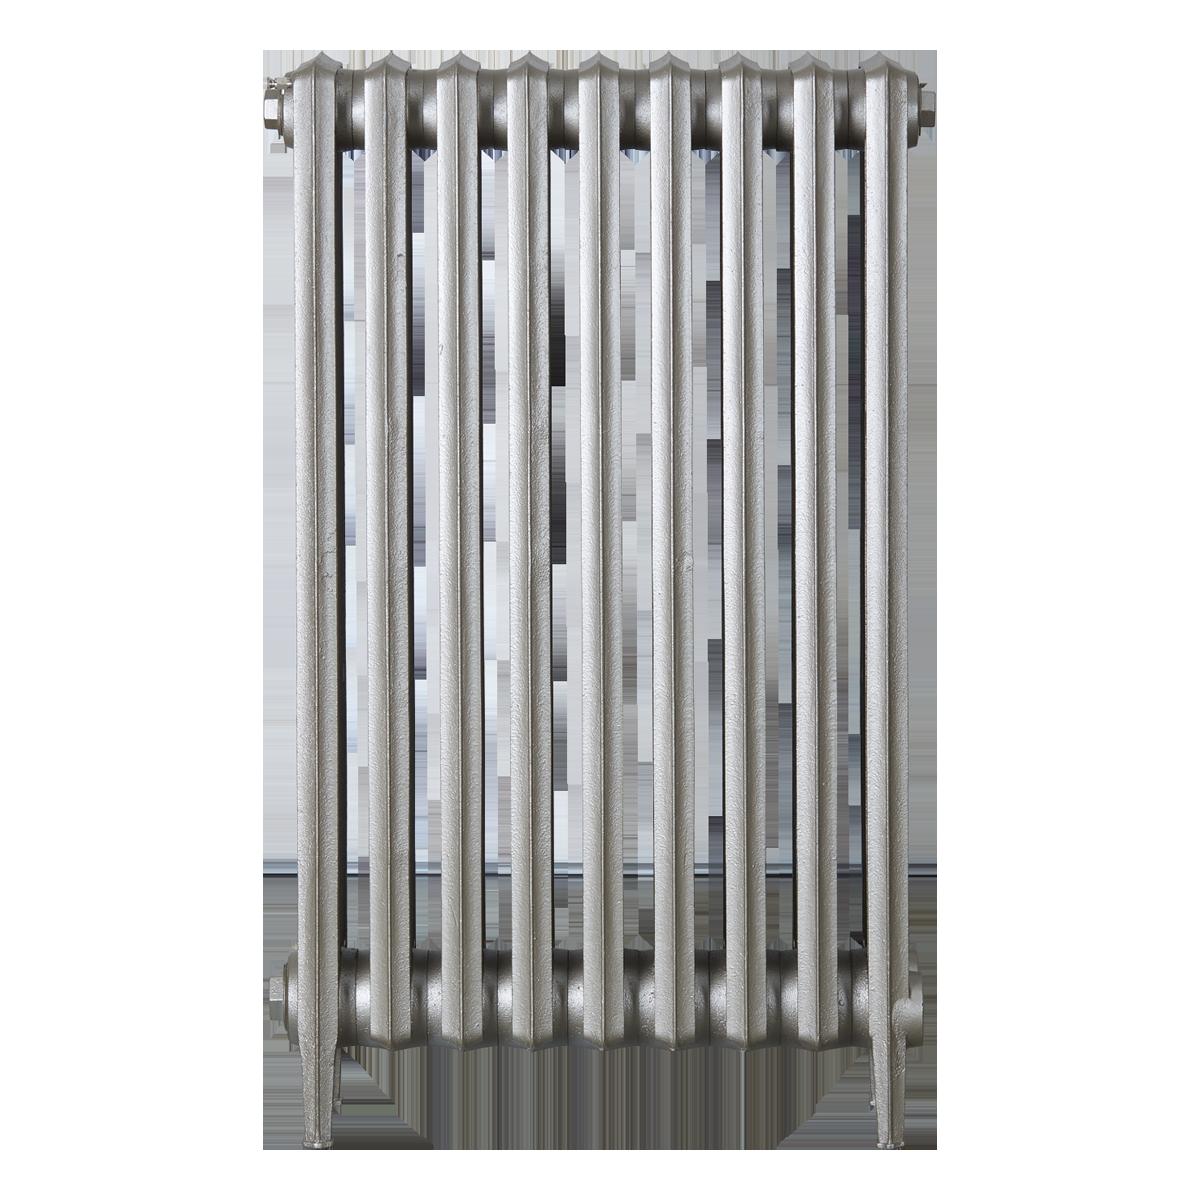 Ironworks Radiators Inc. refurbished cast iron radiator Fairlawn in Nickel Metallic